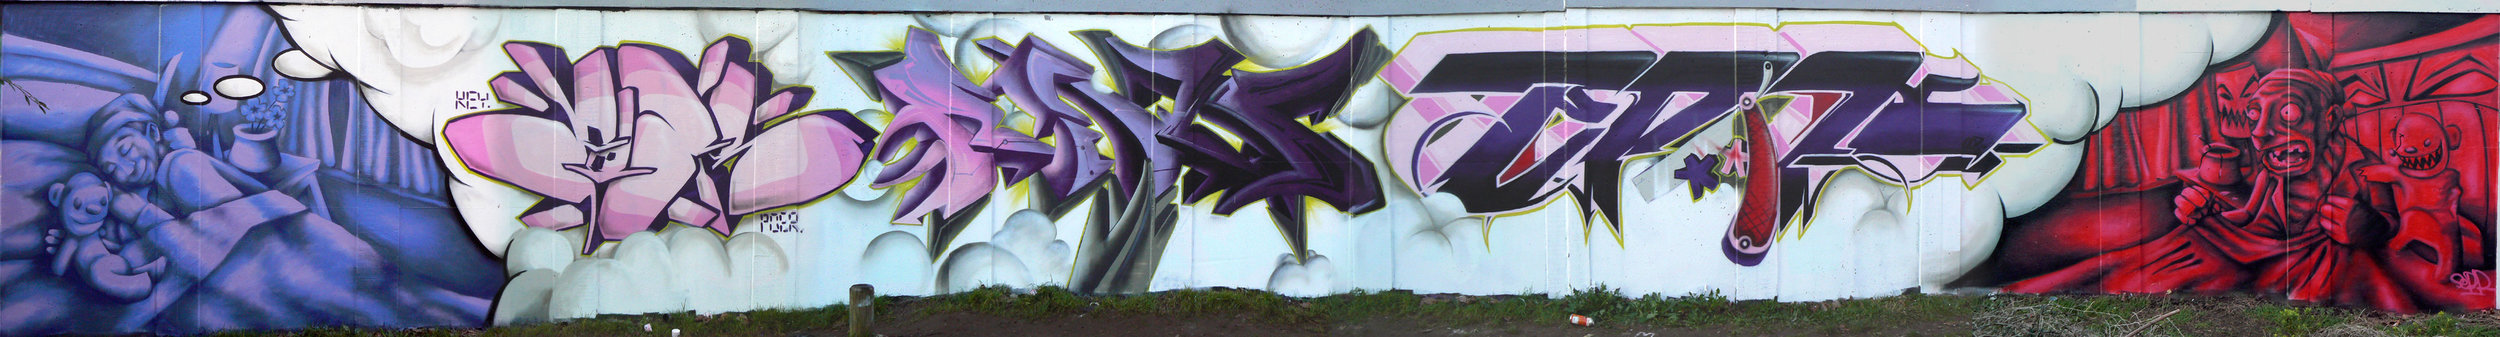 Bristol '07. With Poer, Riks, Epok